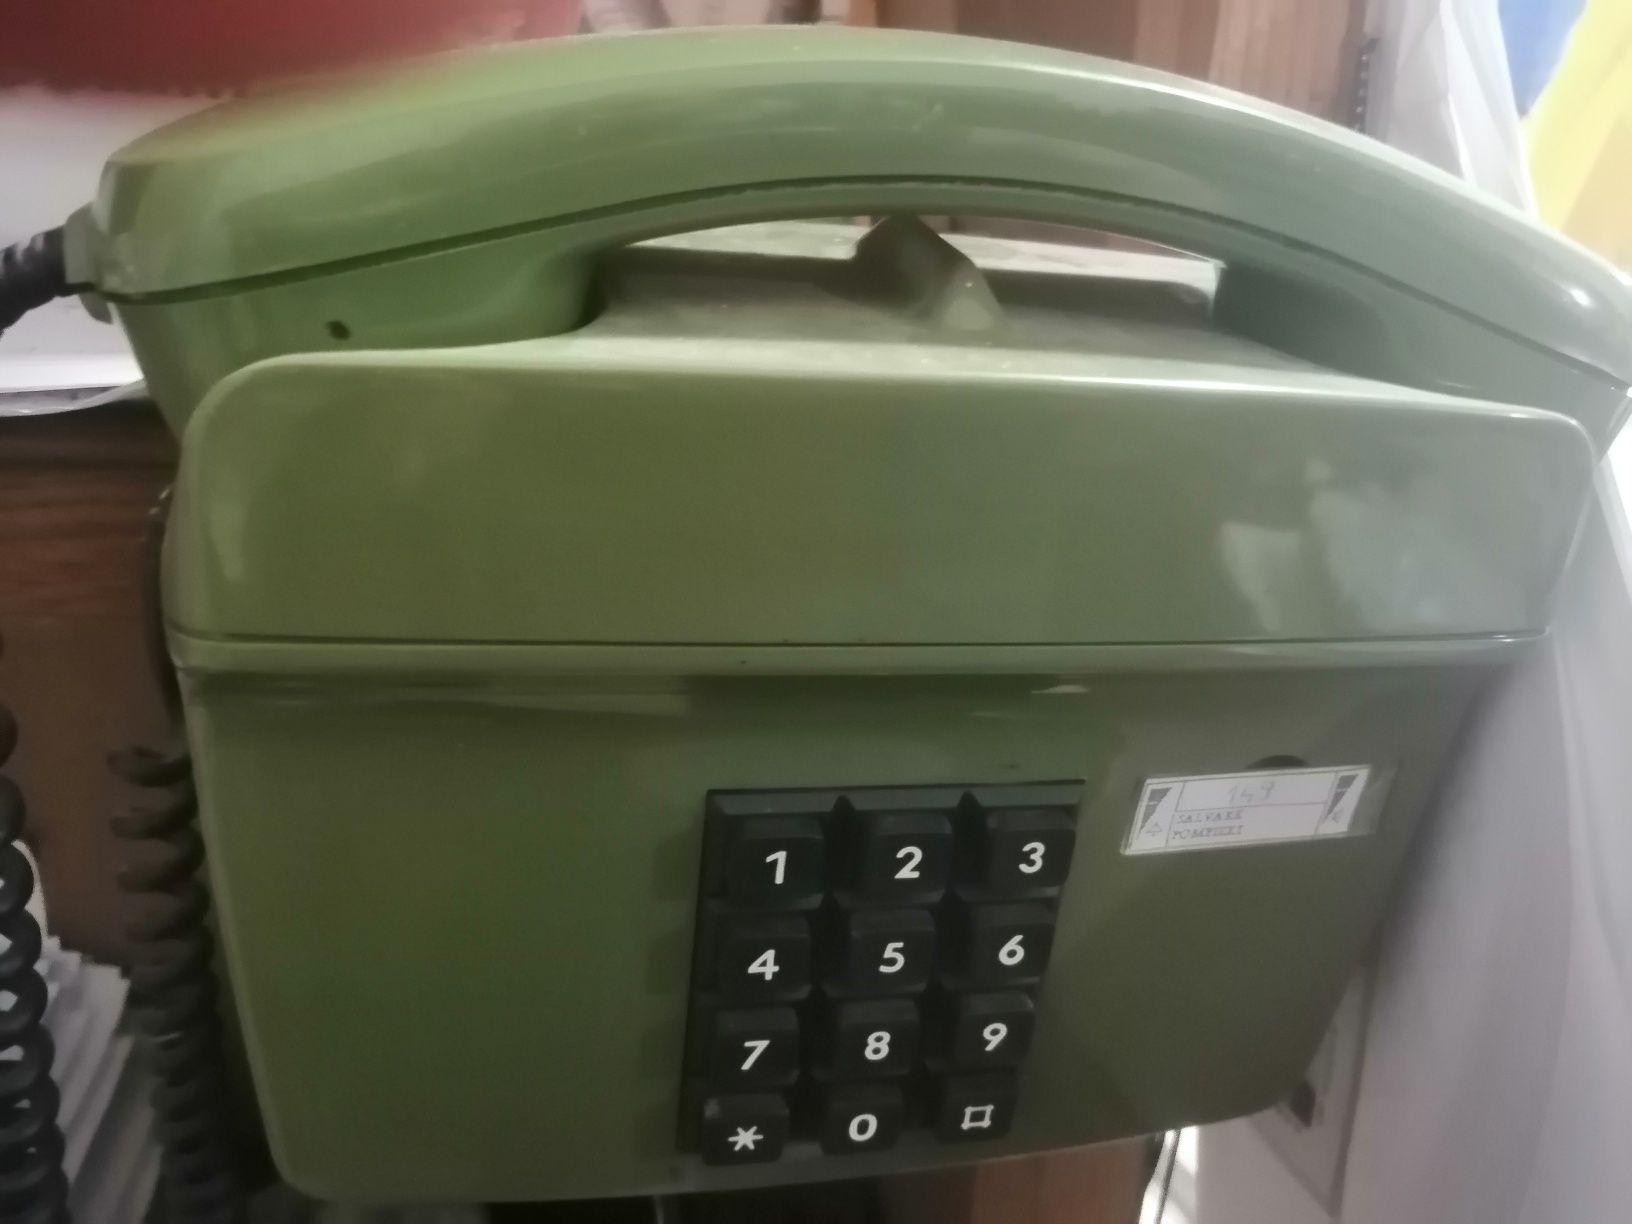 Vand telefon fix vintage, culoare verde-army, plastic, stare perfecta